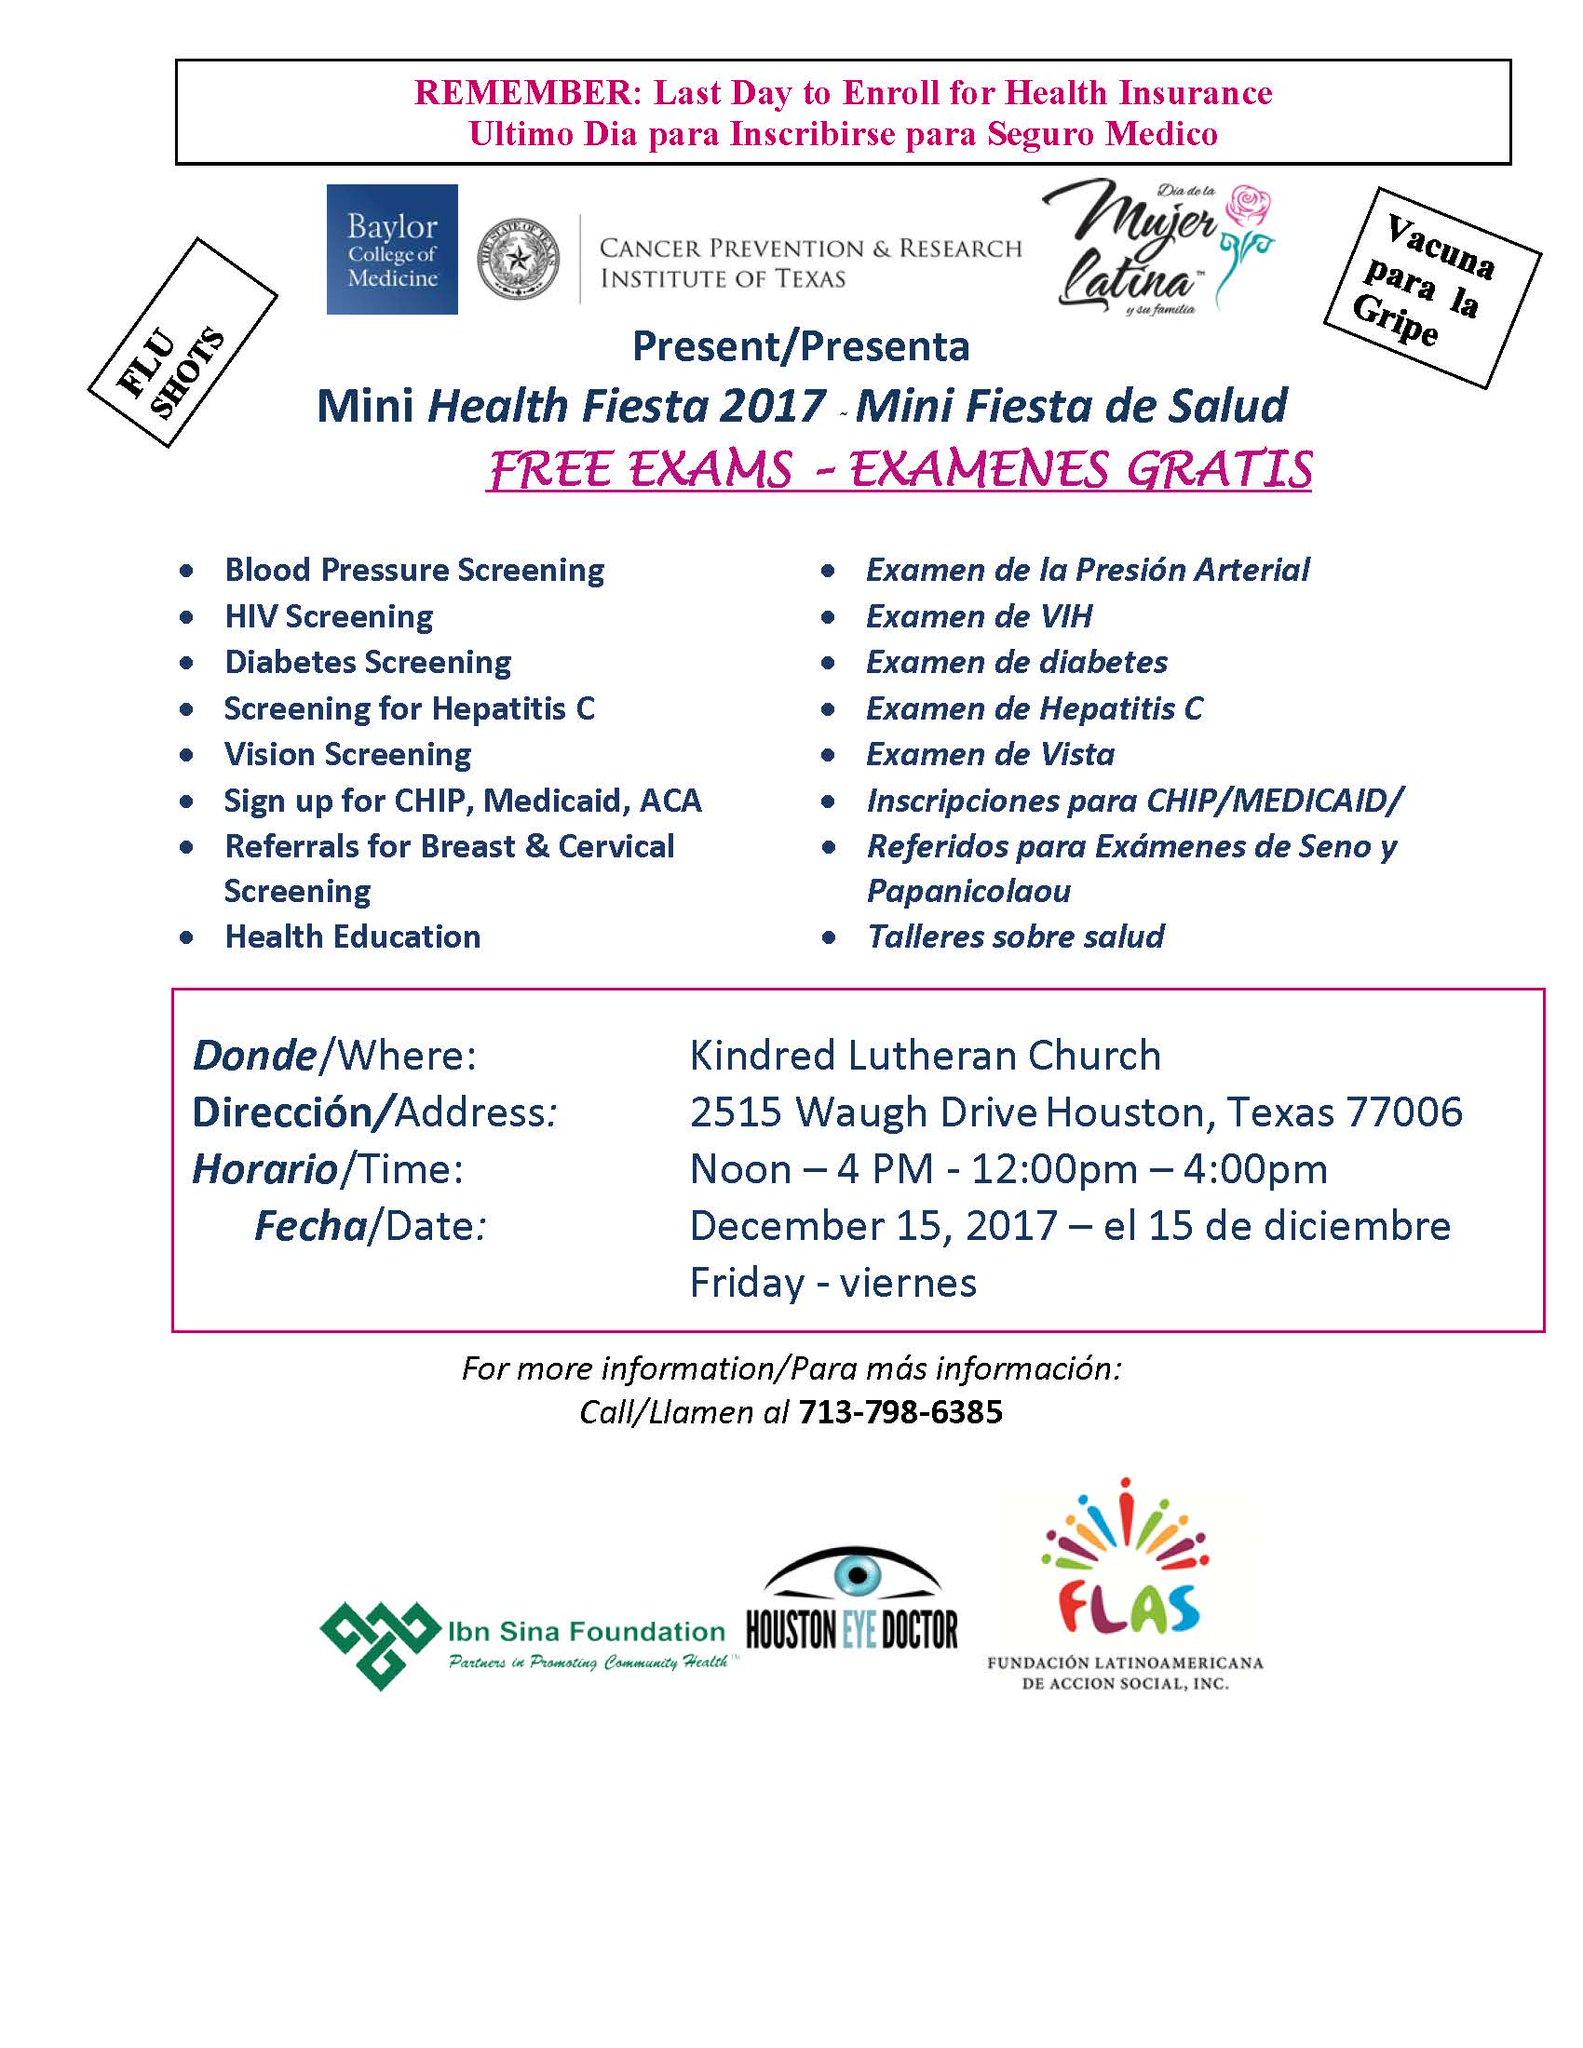 ��#Free. #Health. #Fair. #For. #HOUSTON.��#flushot #vision #screenings #bilingual #montrose #share https://t.co/4fcs9qdsRP